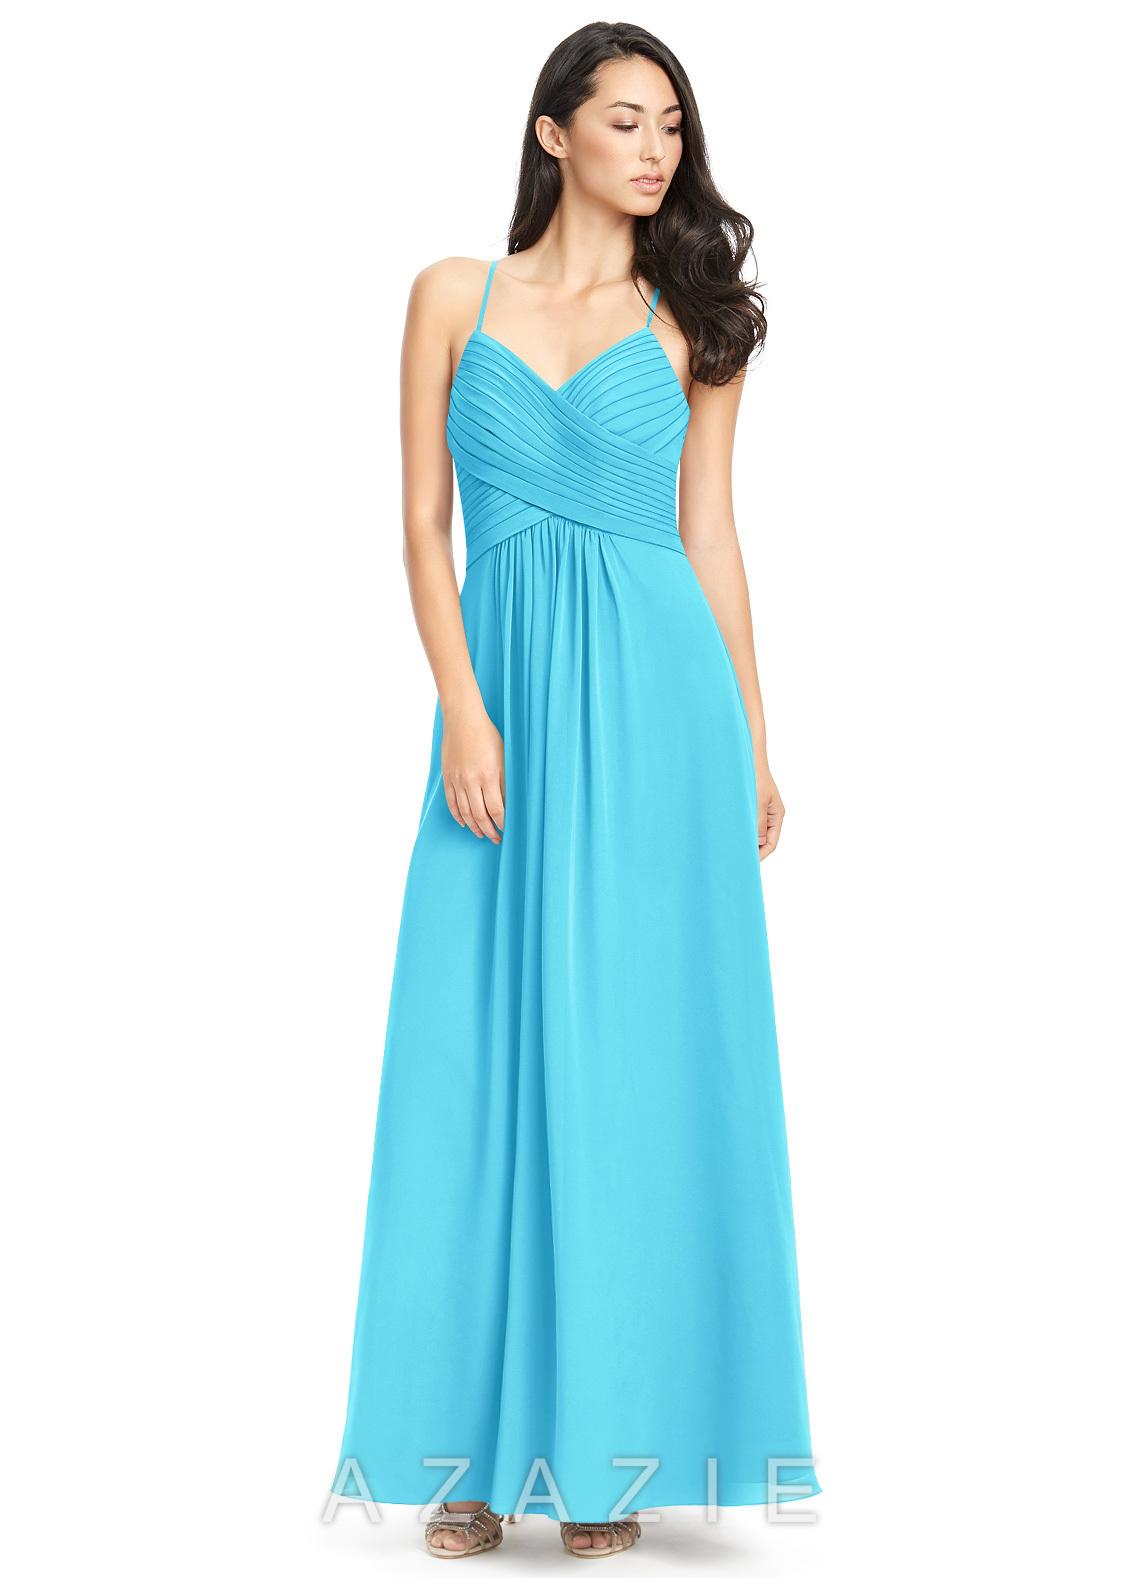 4c3d3e16134 Azazie Haleigh Bridesmaid Dress